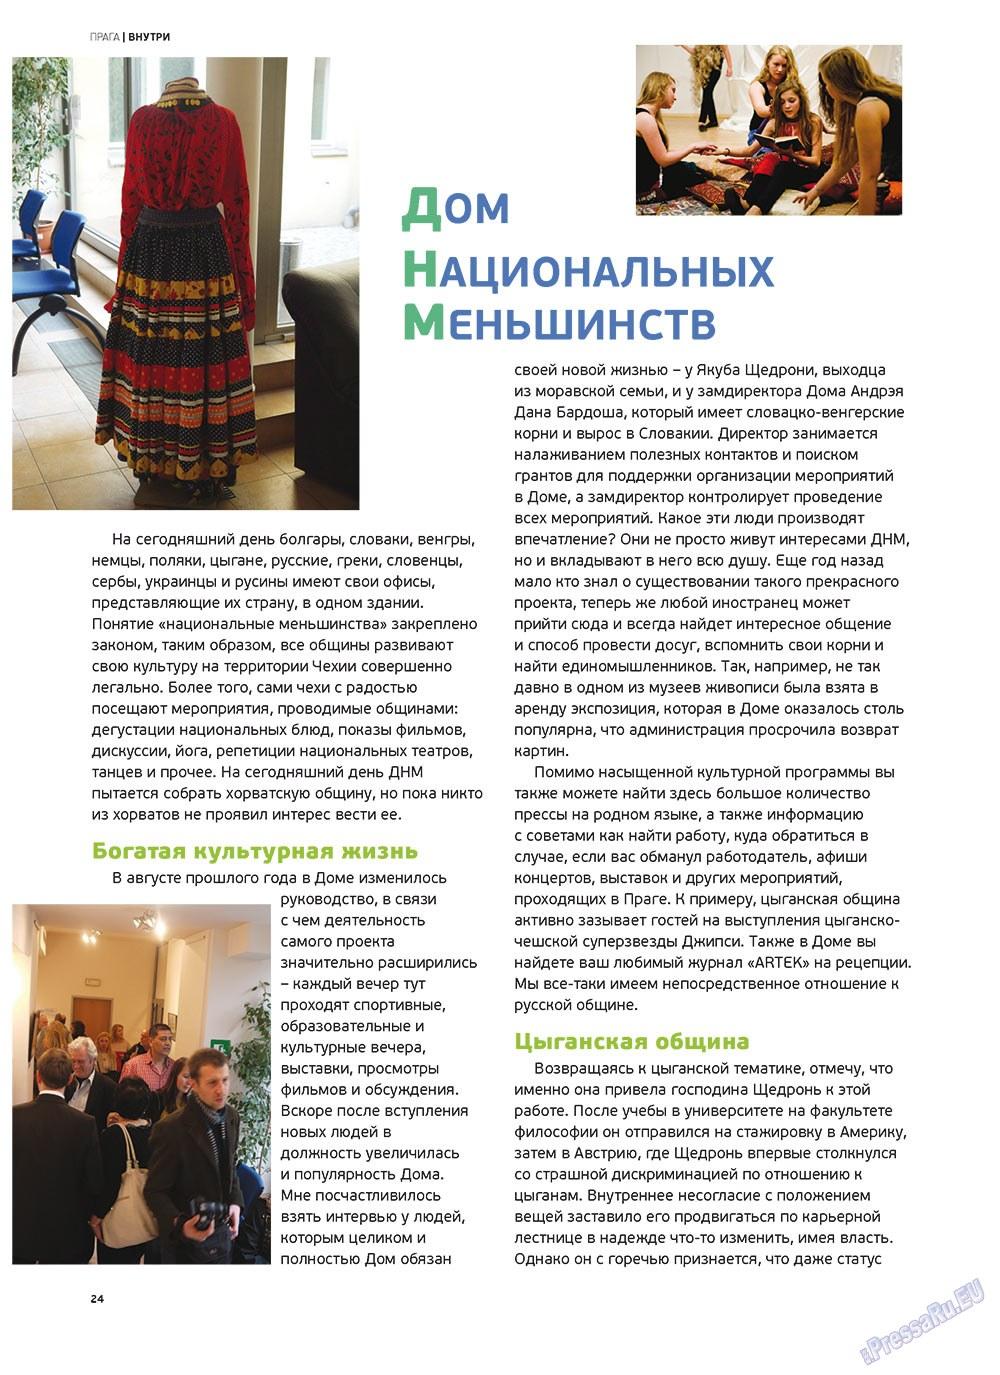 Артек (журнал). 2012 год, номер 1, стр. 26